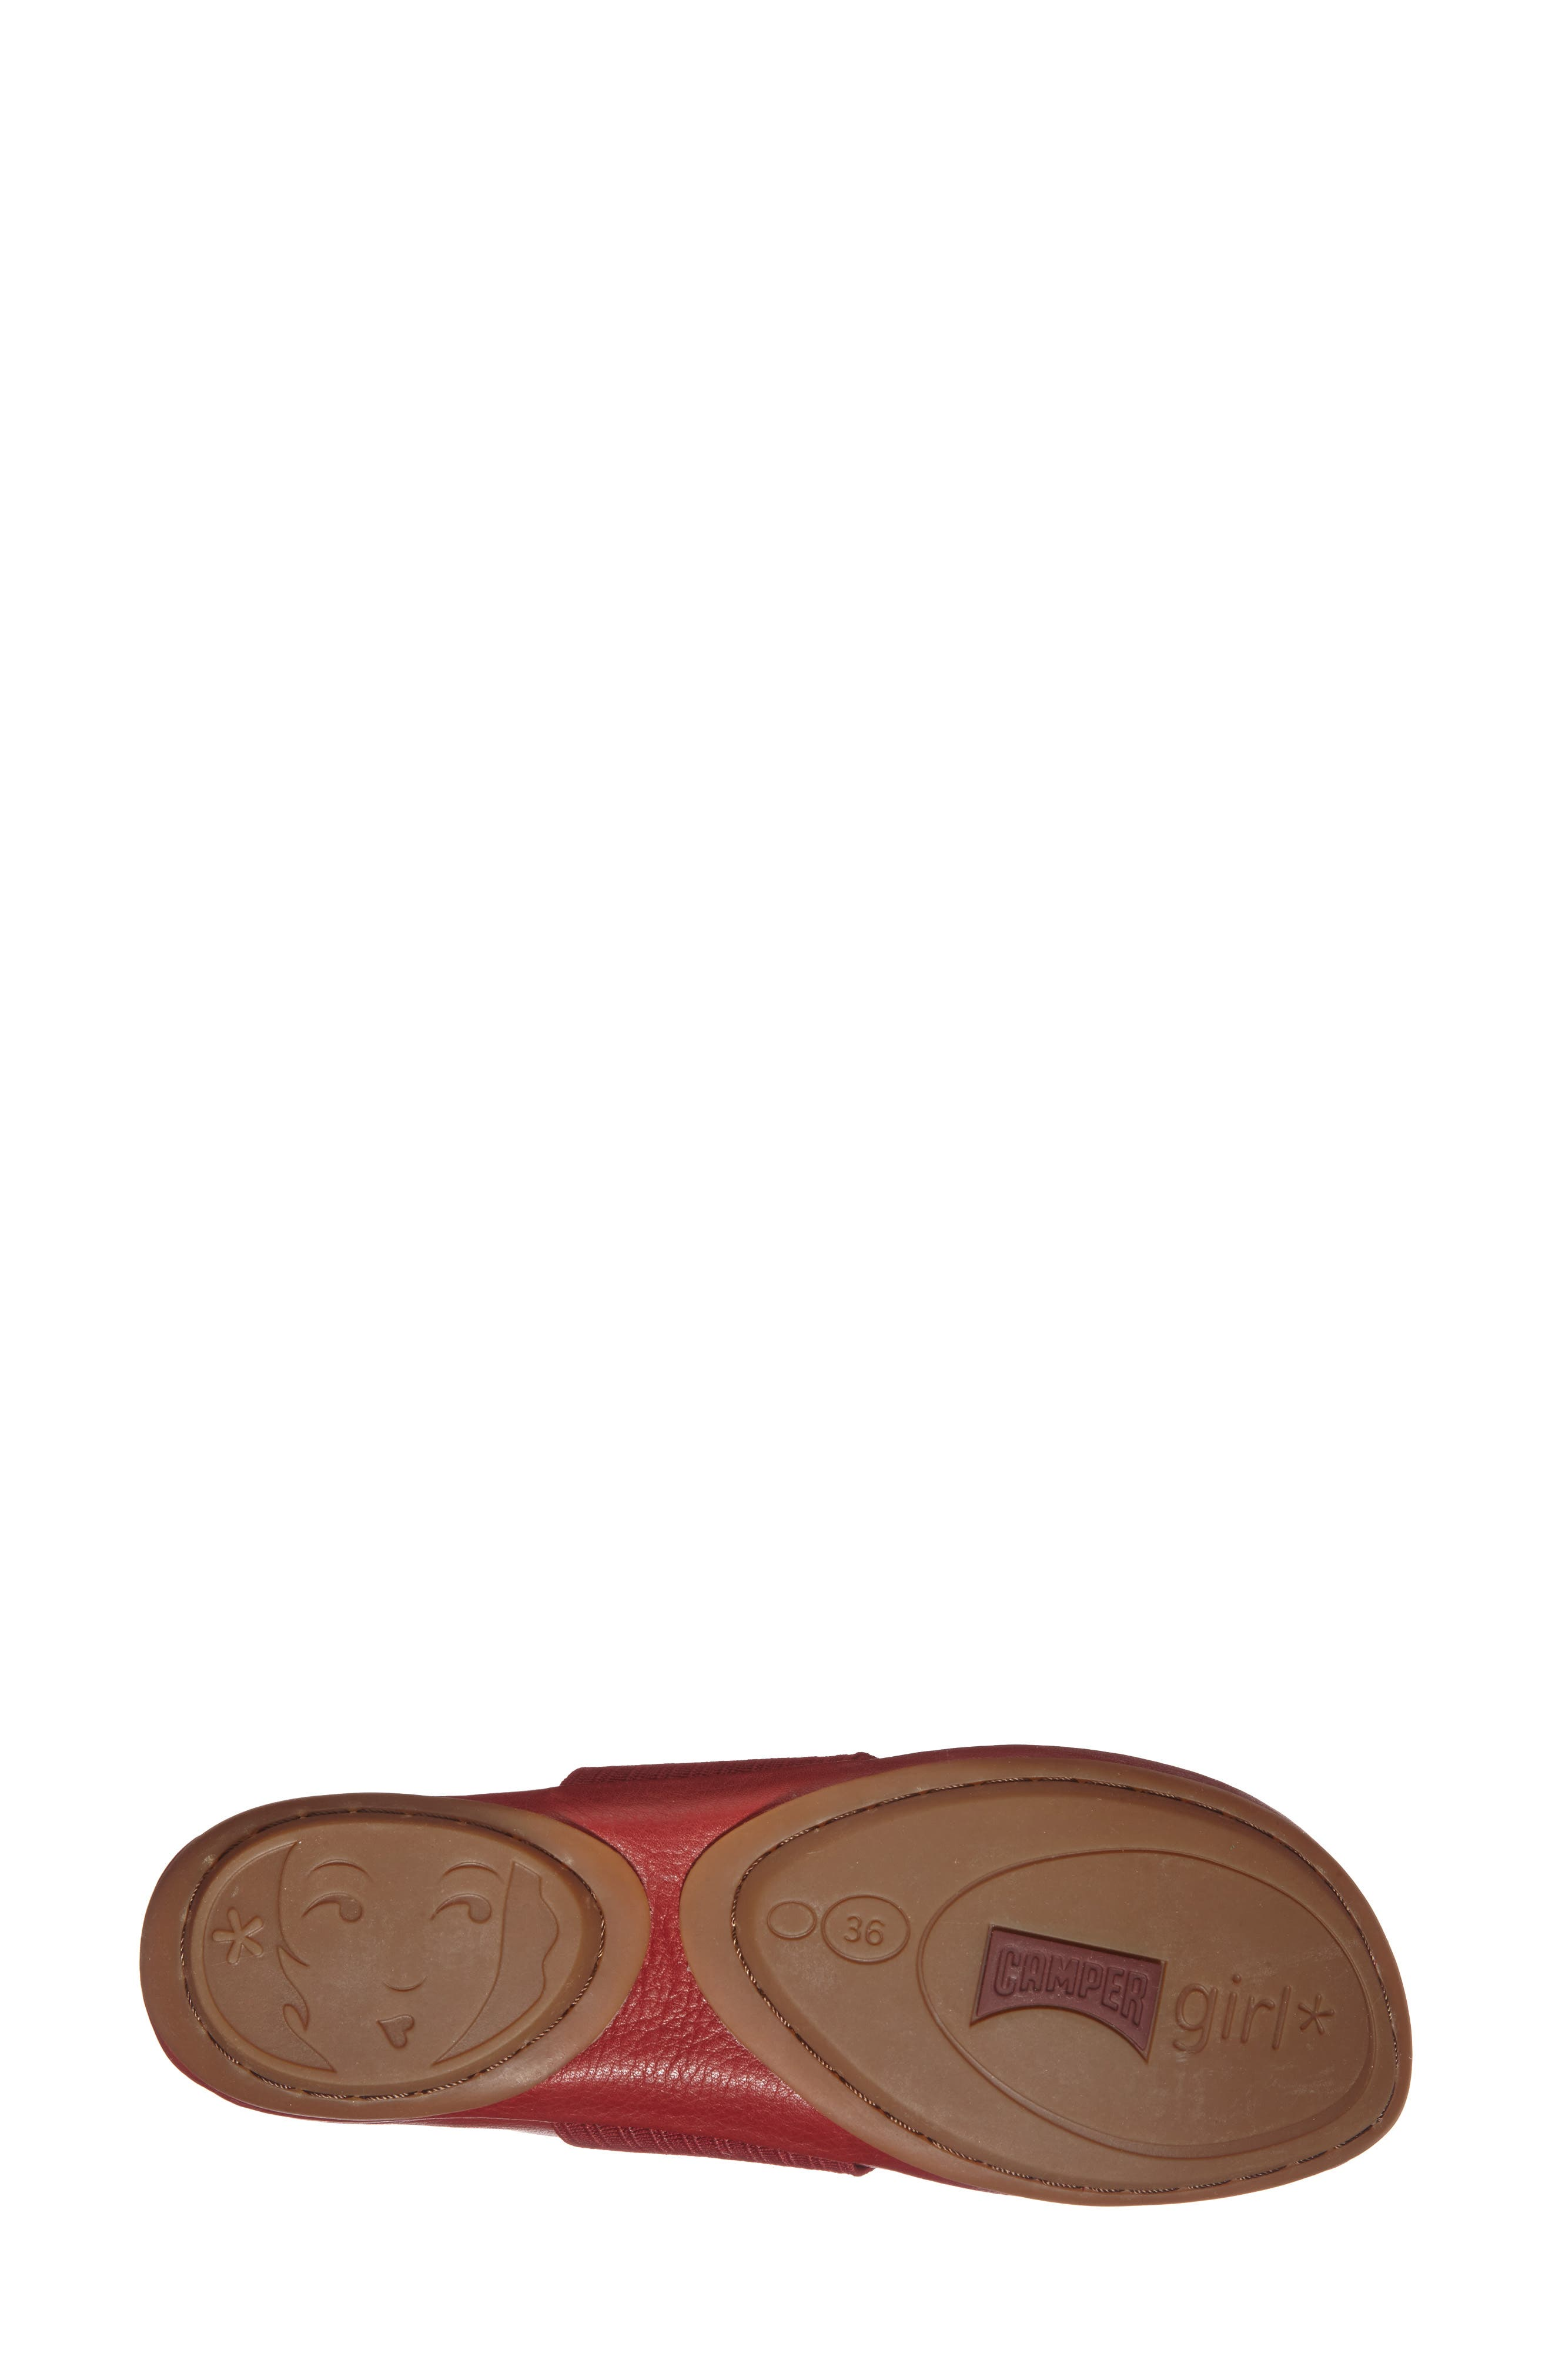 'Right Nina' Leather Ballerina Flat,                             Alternate thumbnail 96, color,